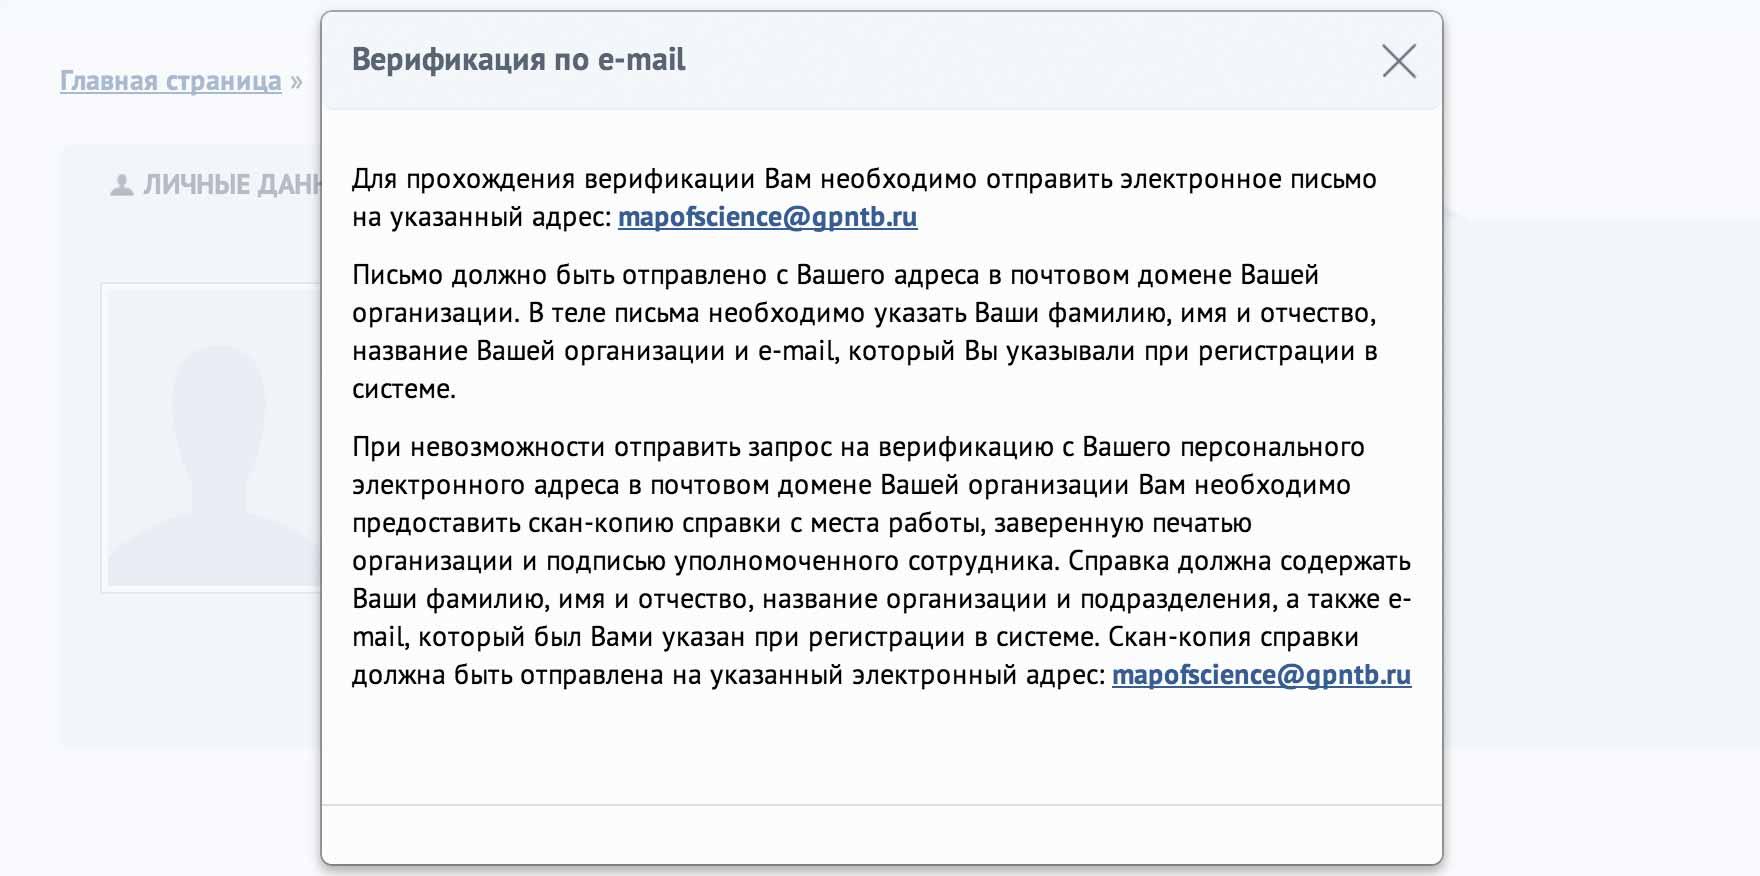 Обзор ИС «Карта российской науки»: от концепции до реализации